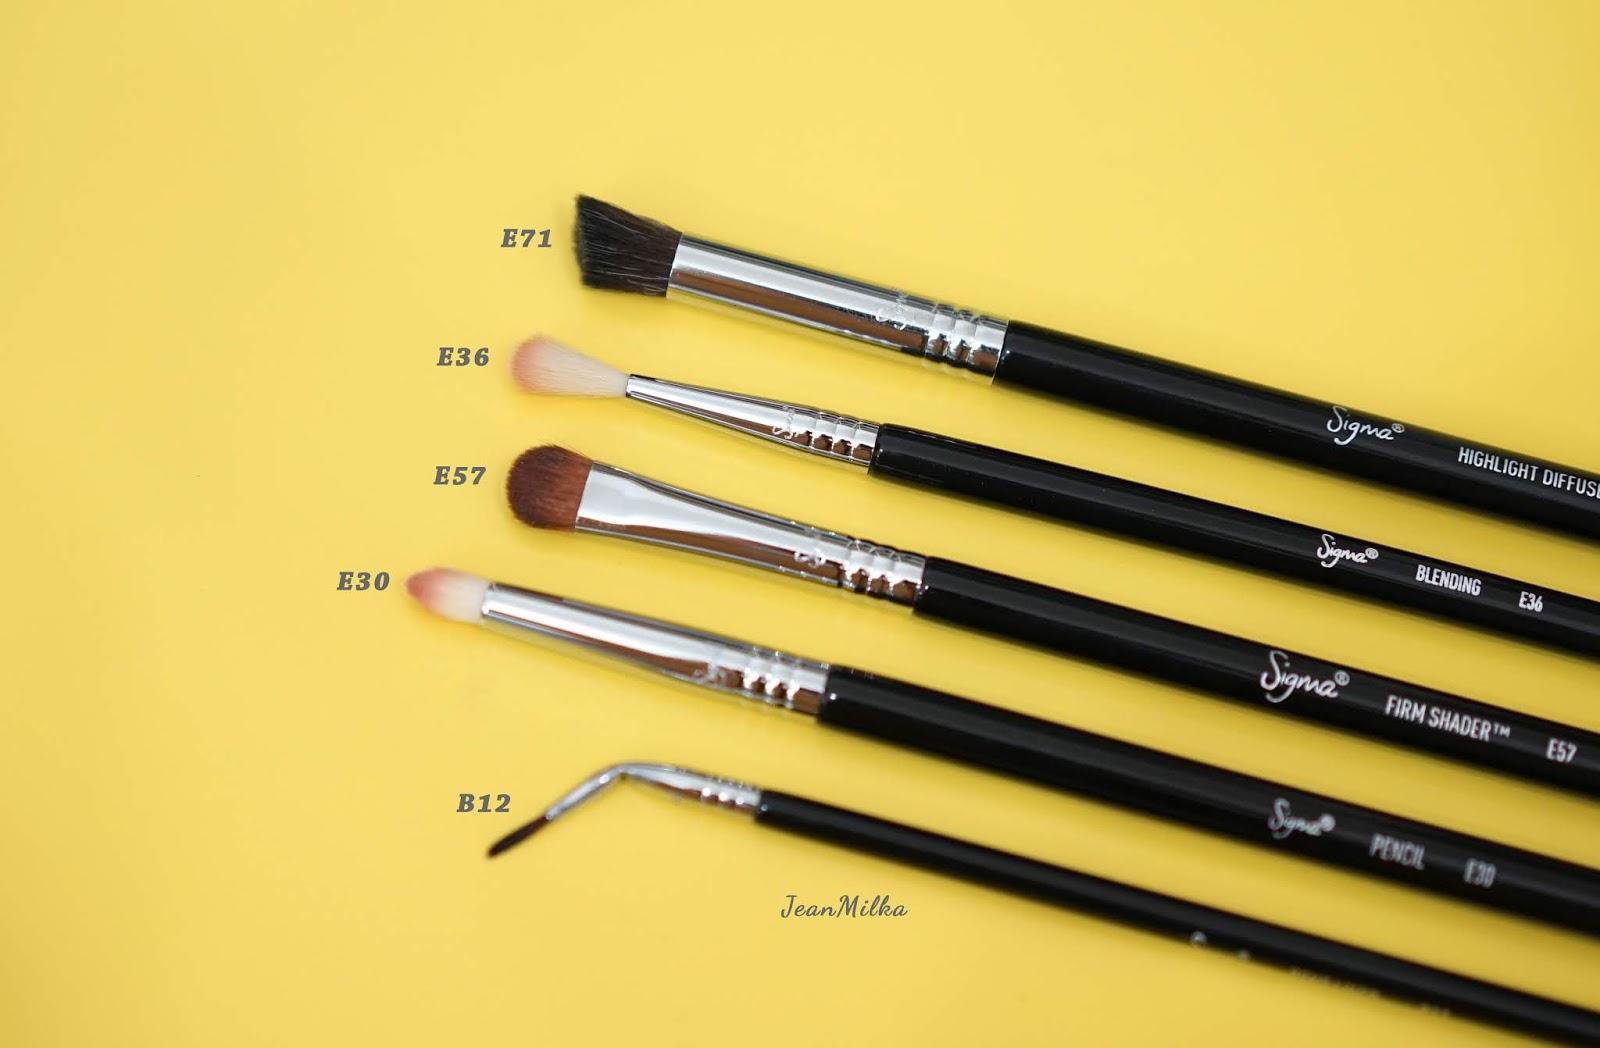 sigma, sigma brush, sigma beauty, sigma eye brush, eye brush, brush mata, makeup tools, sigma code, sigma discount code, sigma coupon code, sigma beauty discount